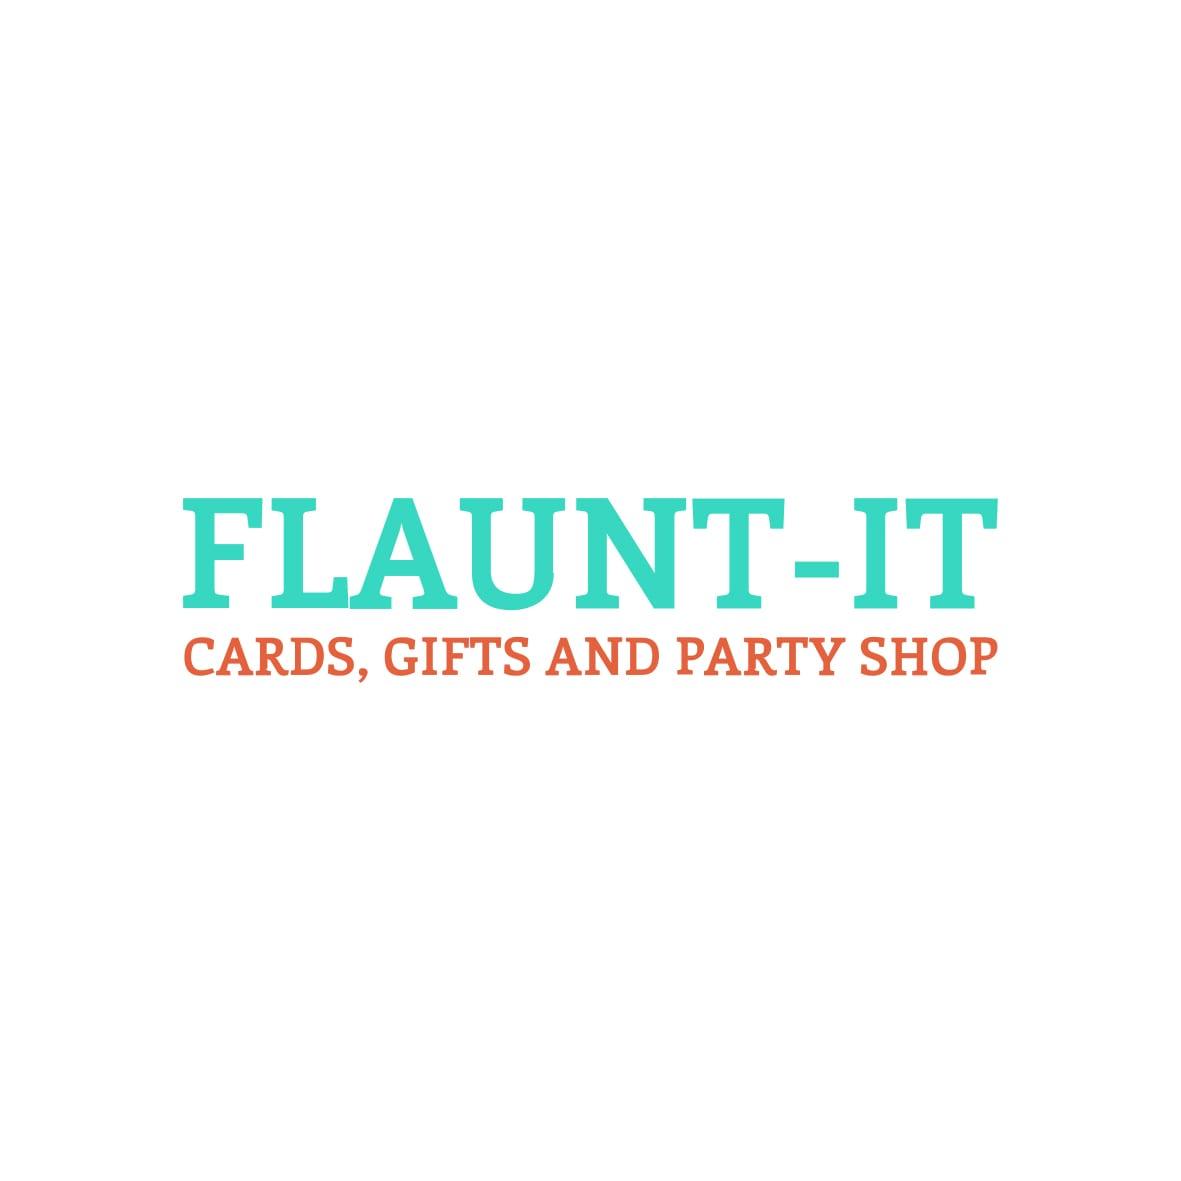 Flaunt It Logo